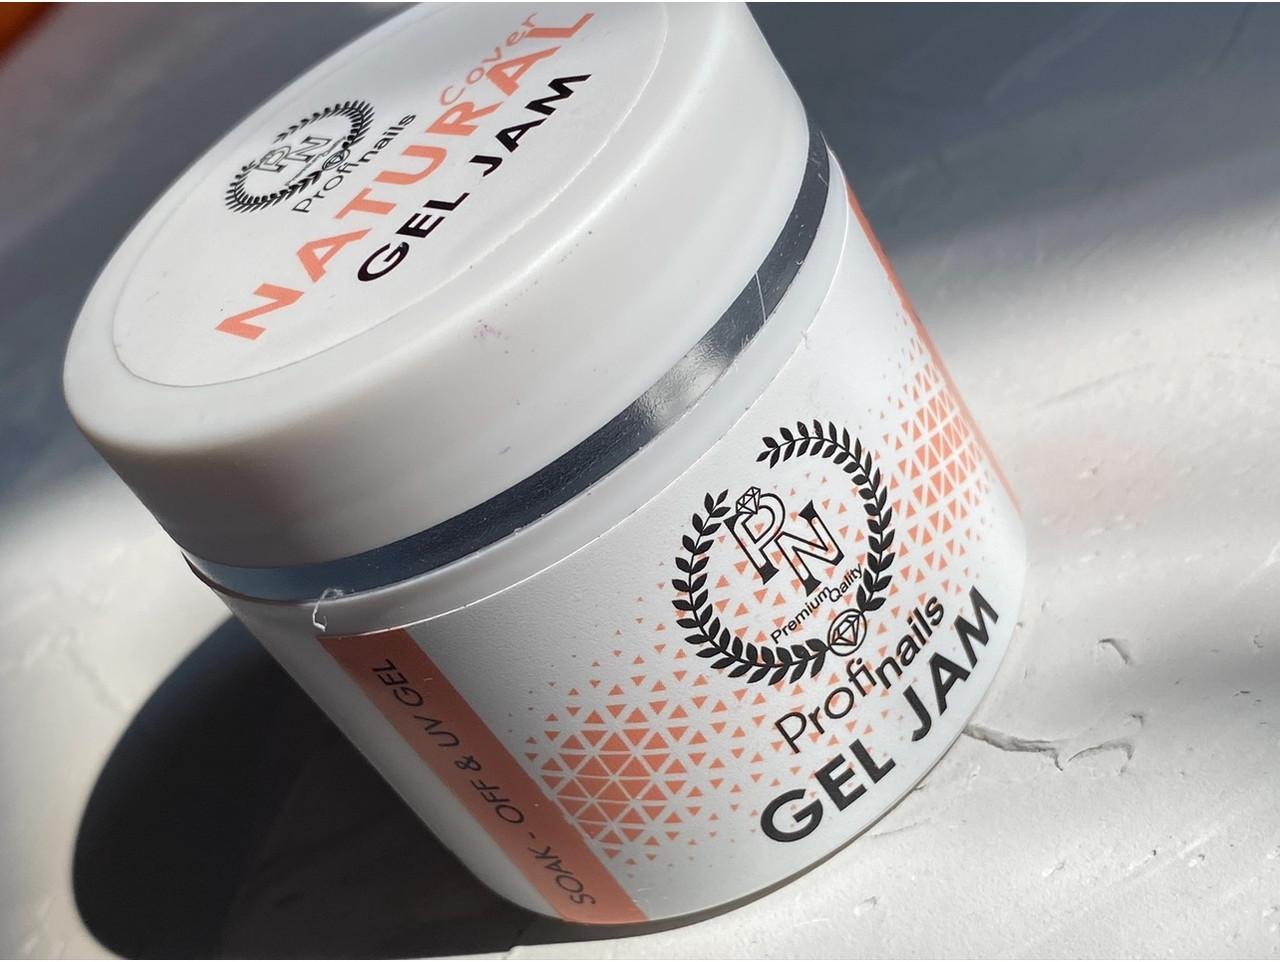 Gel jam Profi nails natural (Гель желе для френча розовый)30 мл